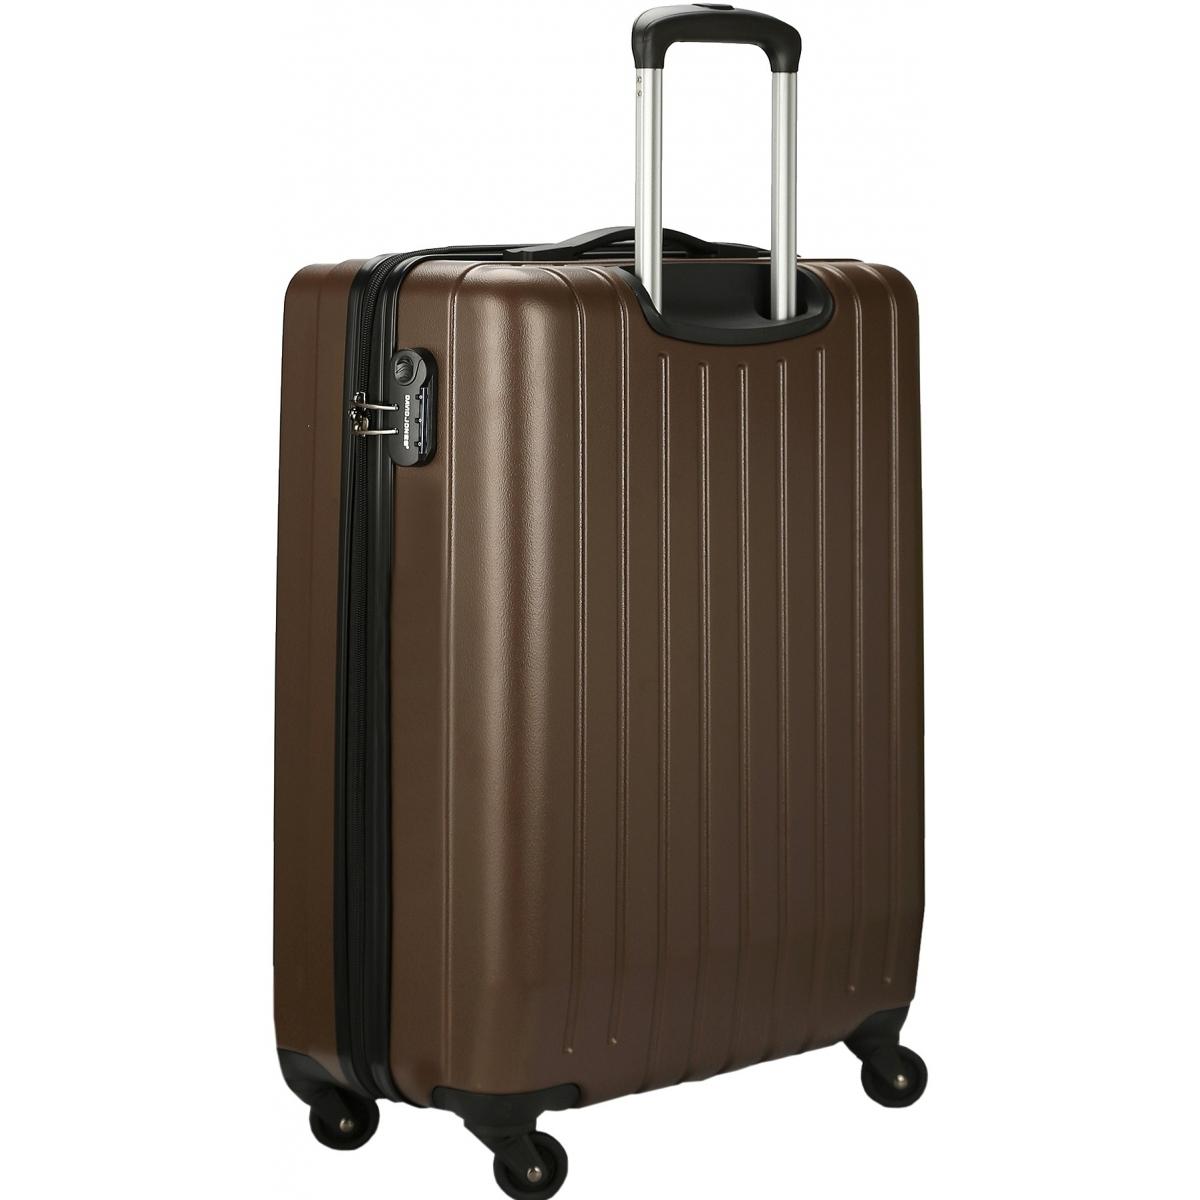 valise cabine rigide david jones 55cm ba10151p couleur principale brown valise pas cher. Black Bedroom Furniture Sets. Home Design Ideas